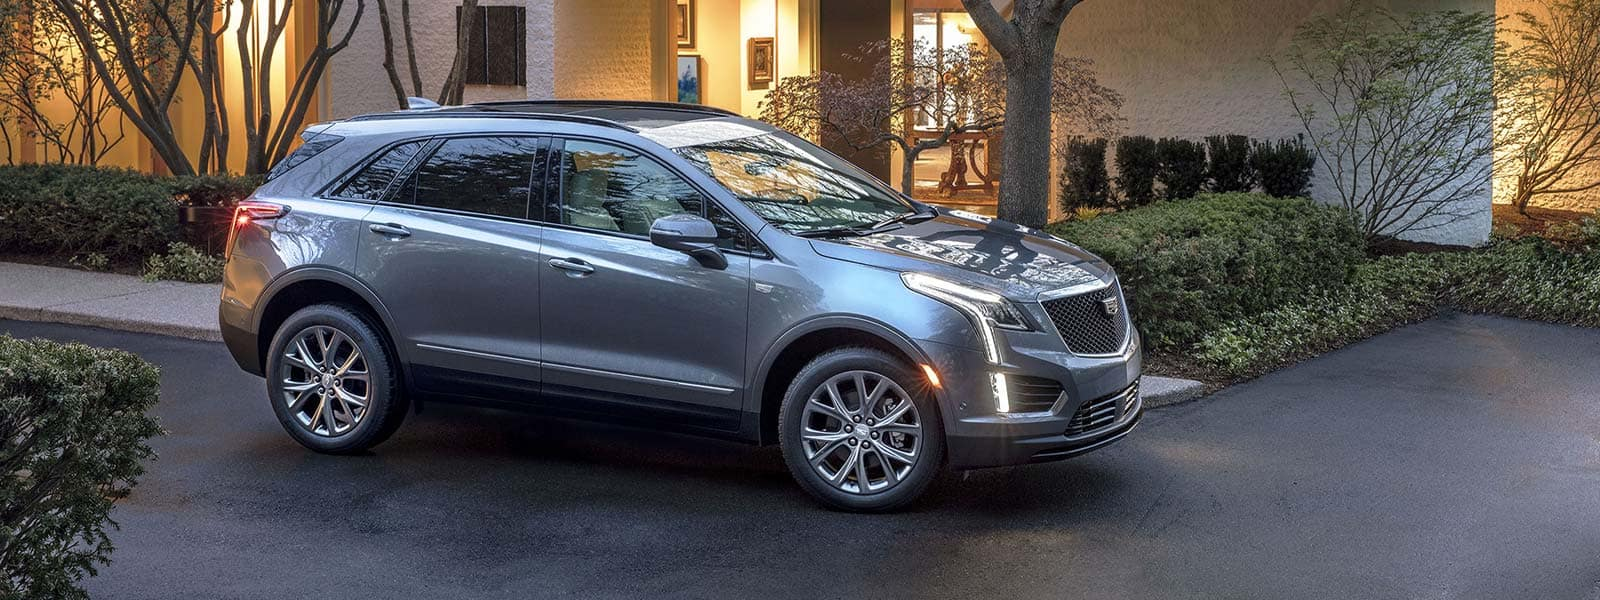 Buy or lease new 2021 Cadillac XT5 in Woodbridge Ontario